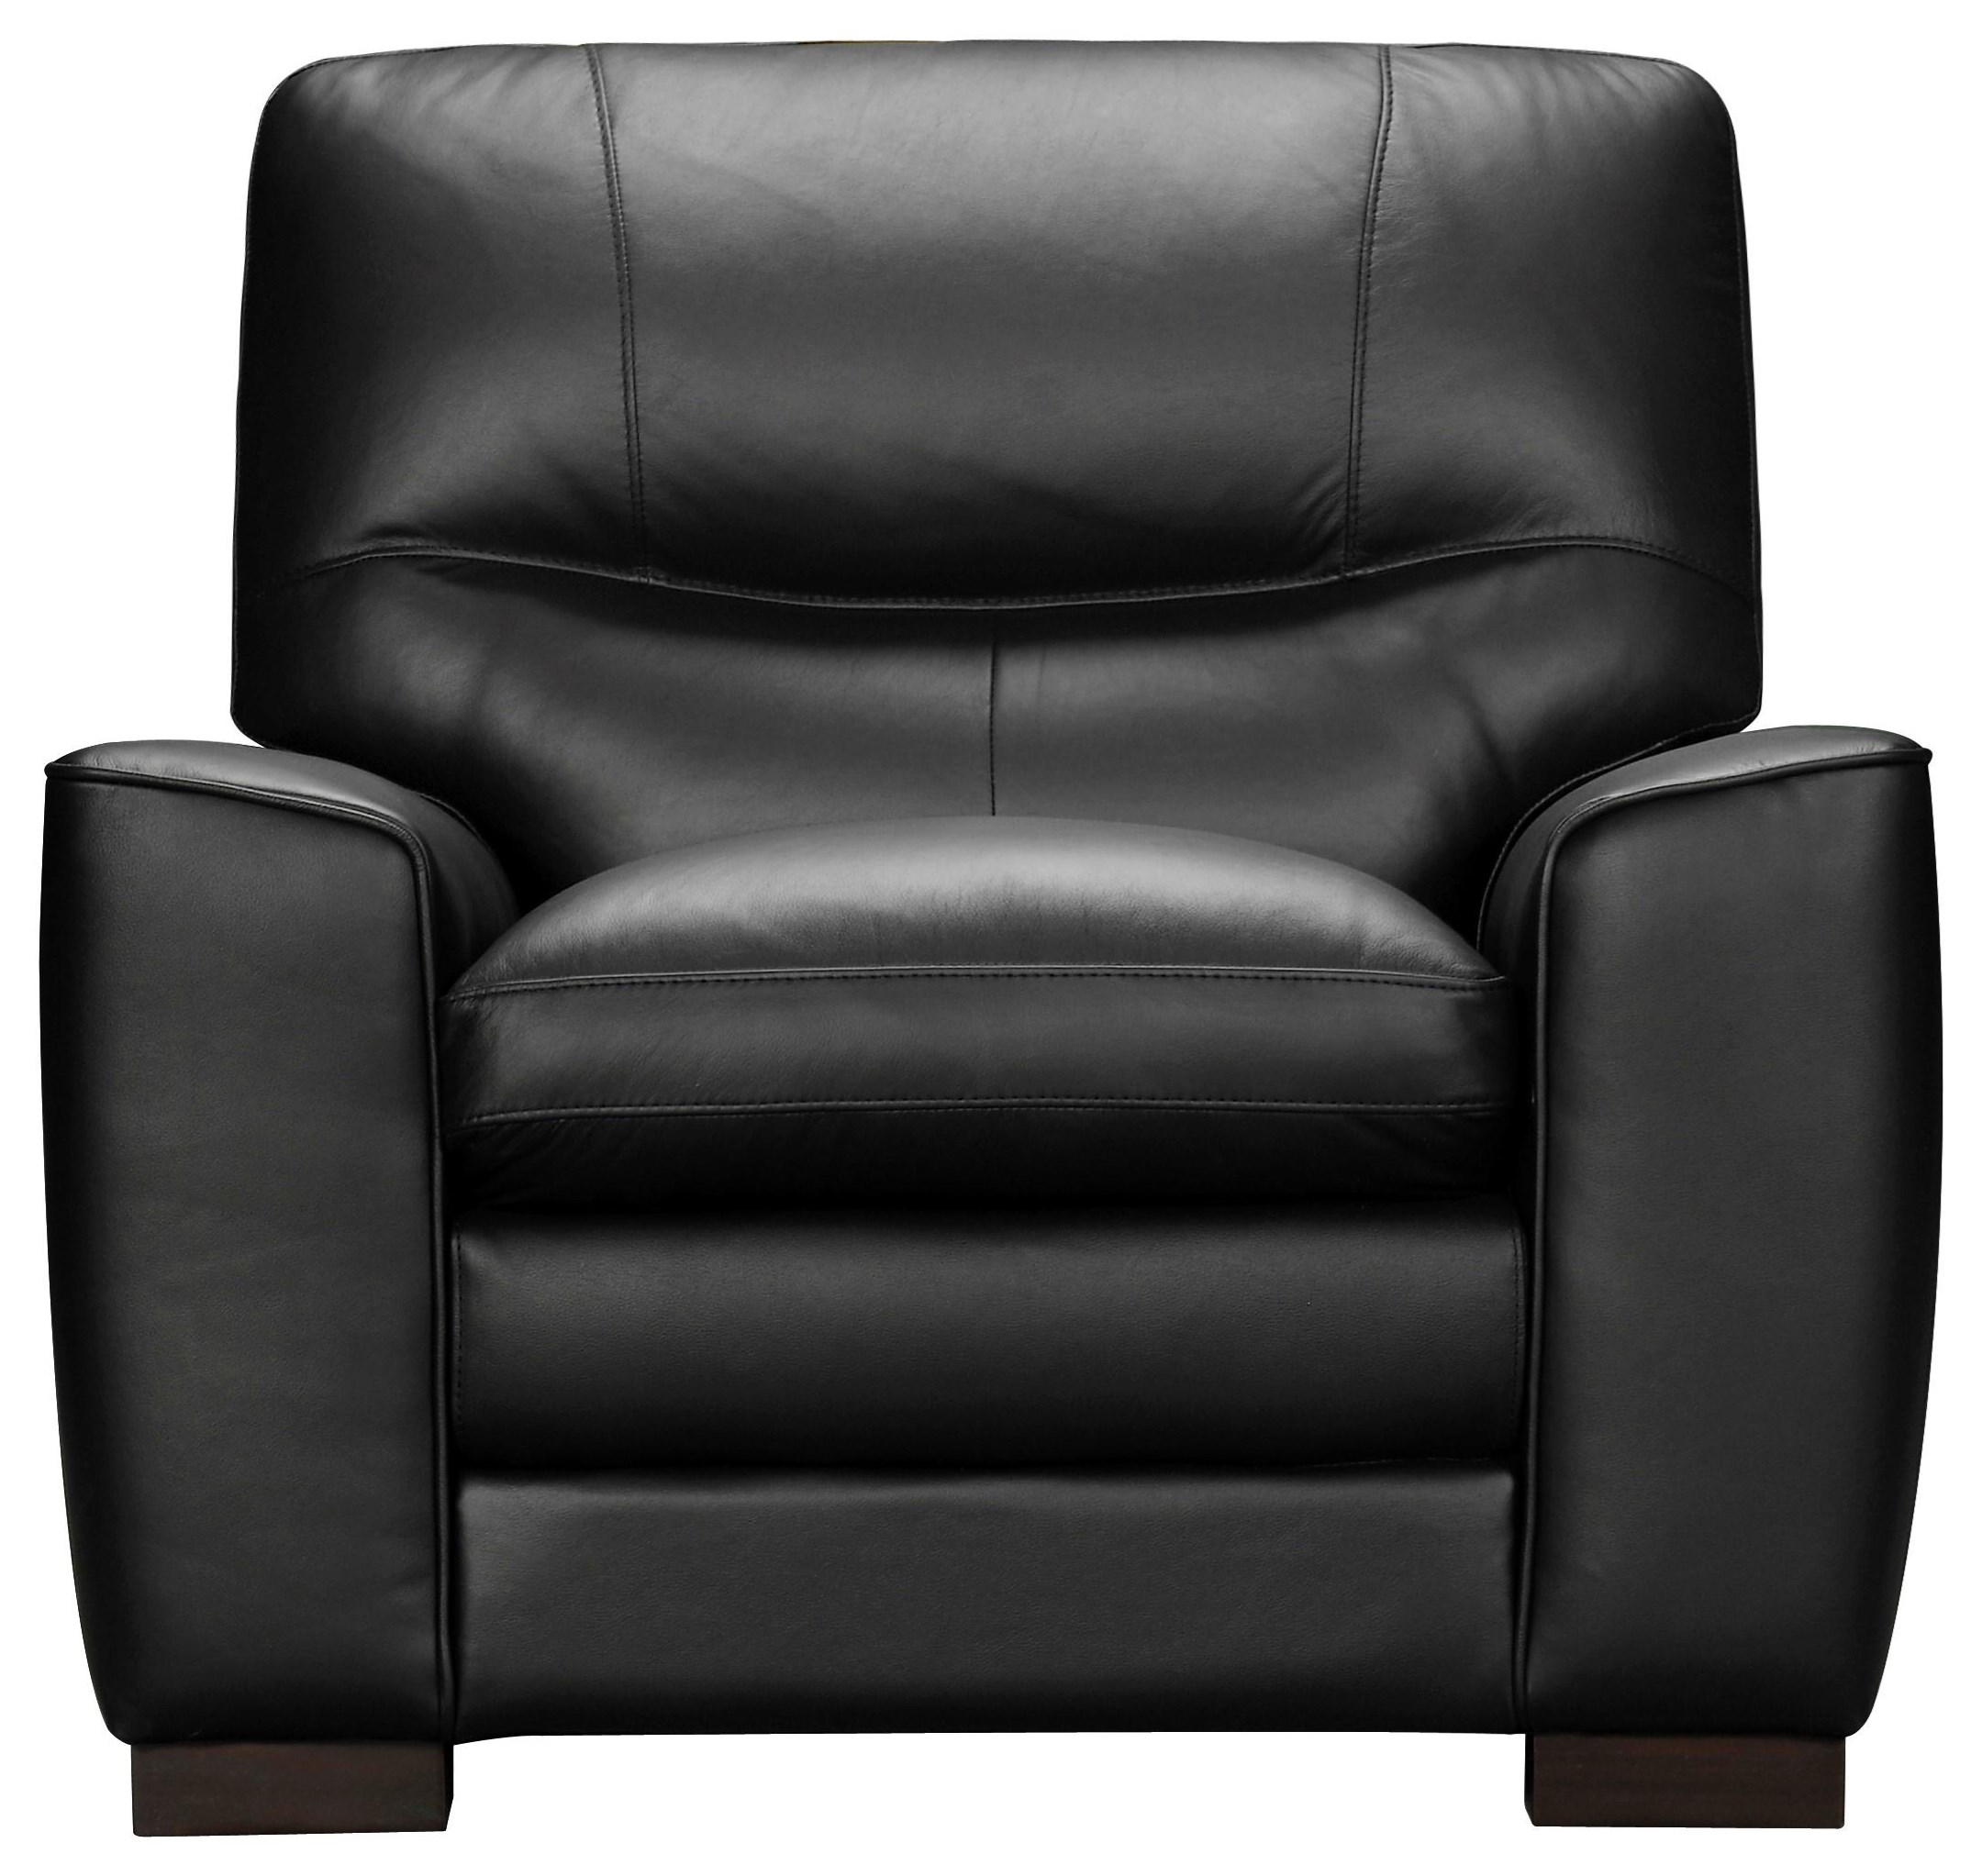 Remarkable Lane Chair Beatyapartments Chair Design Images Beatyapartmentscom